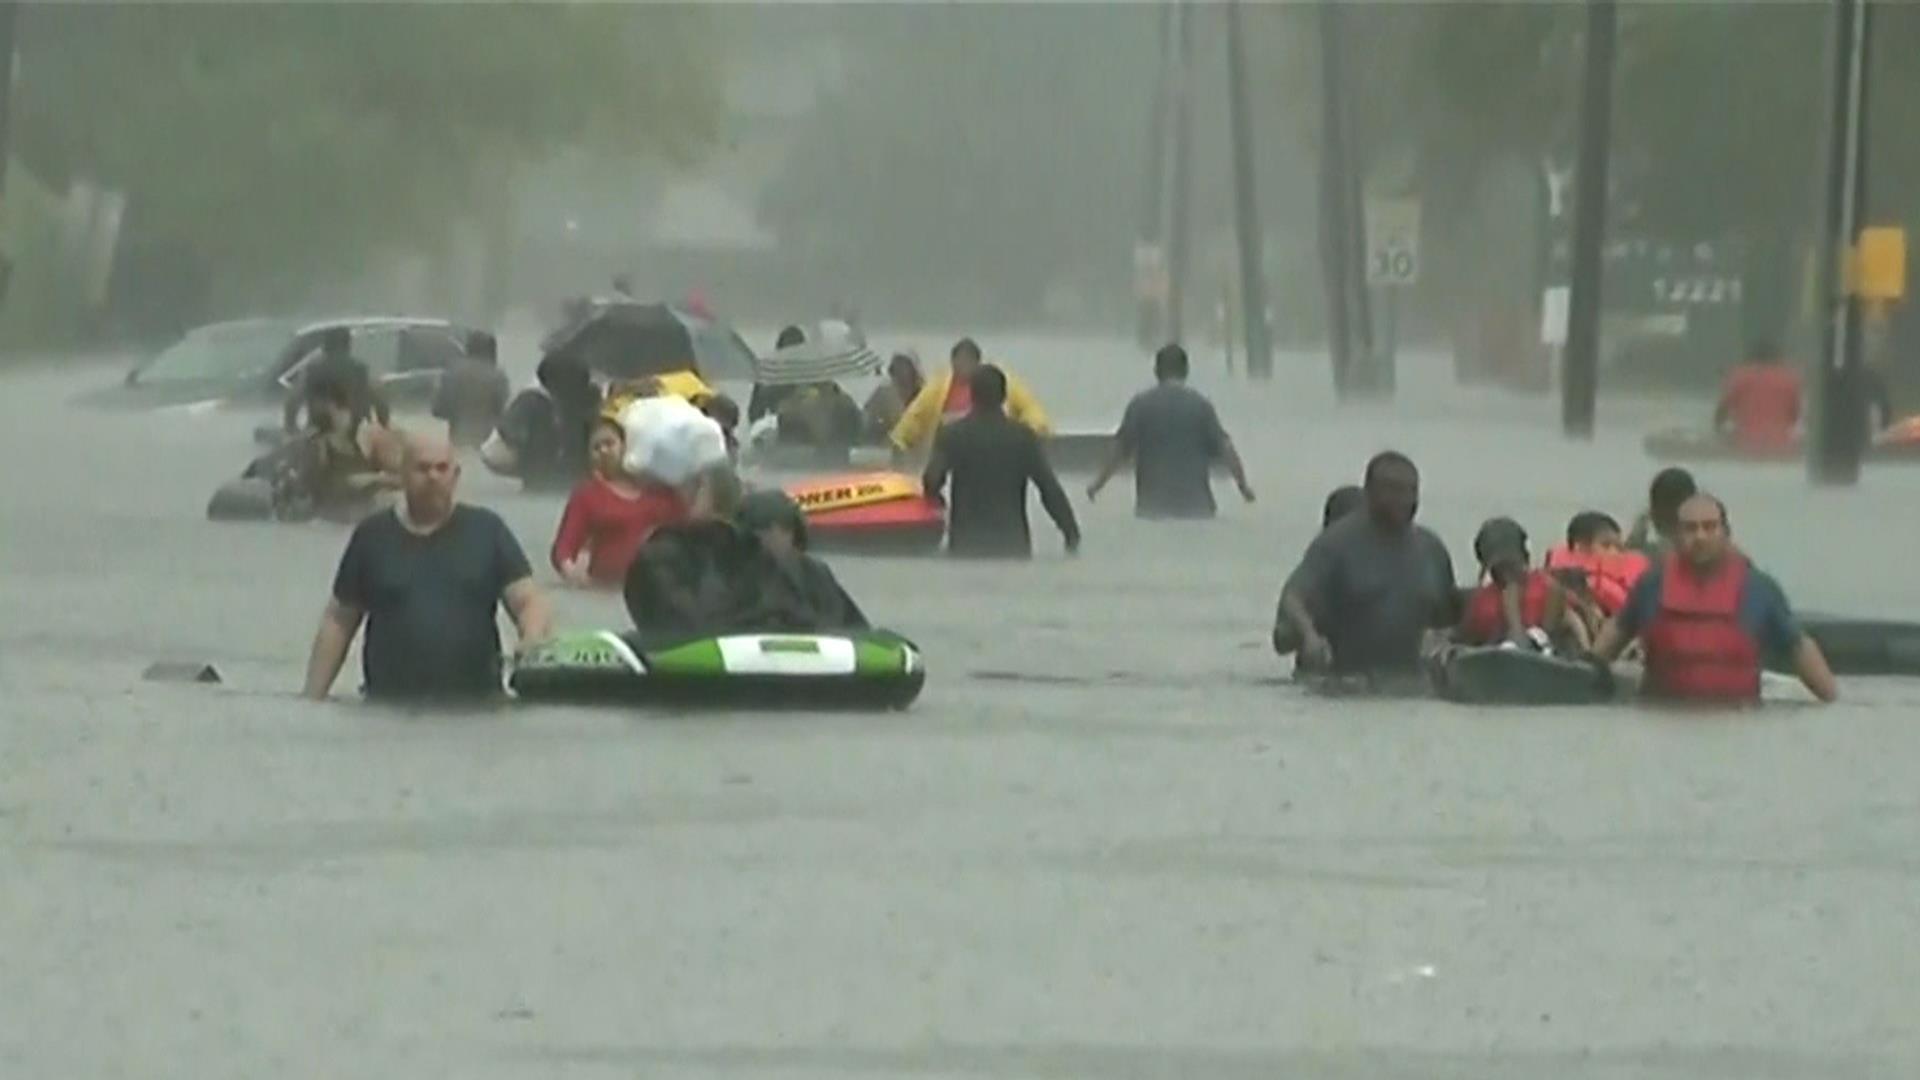 Hurricane Harvey will linger over southeast Texas, bringing still more rain - NBC News